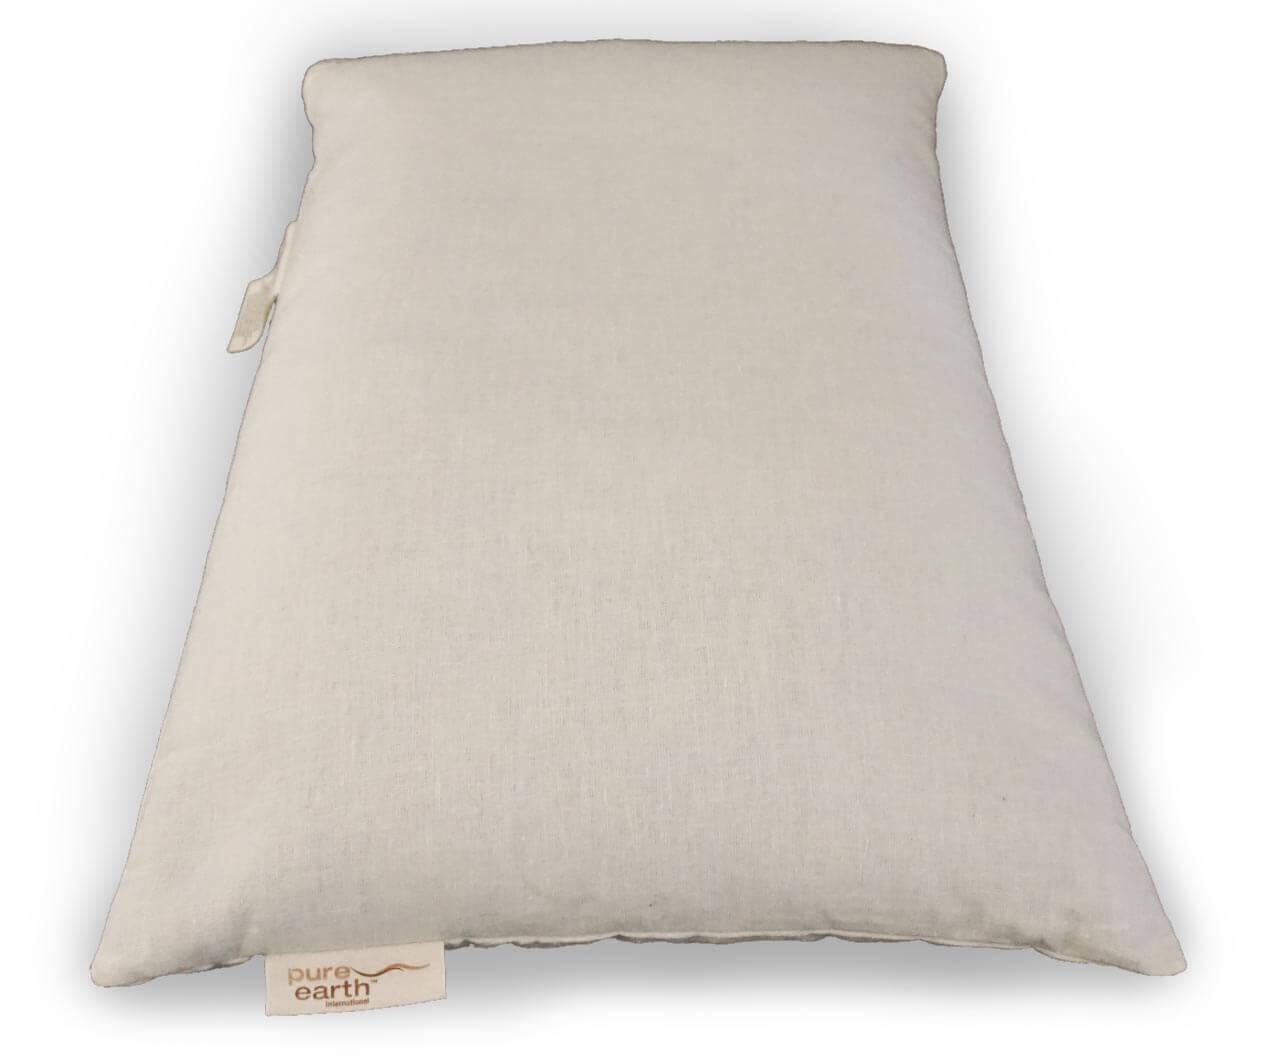 Standard Pillow  Organic Hemp Buckwheat Husk  Pure Earth